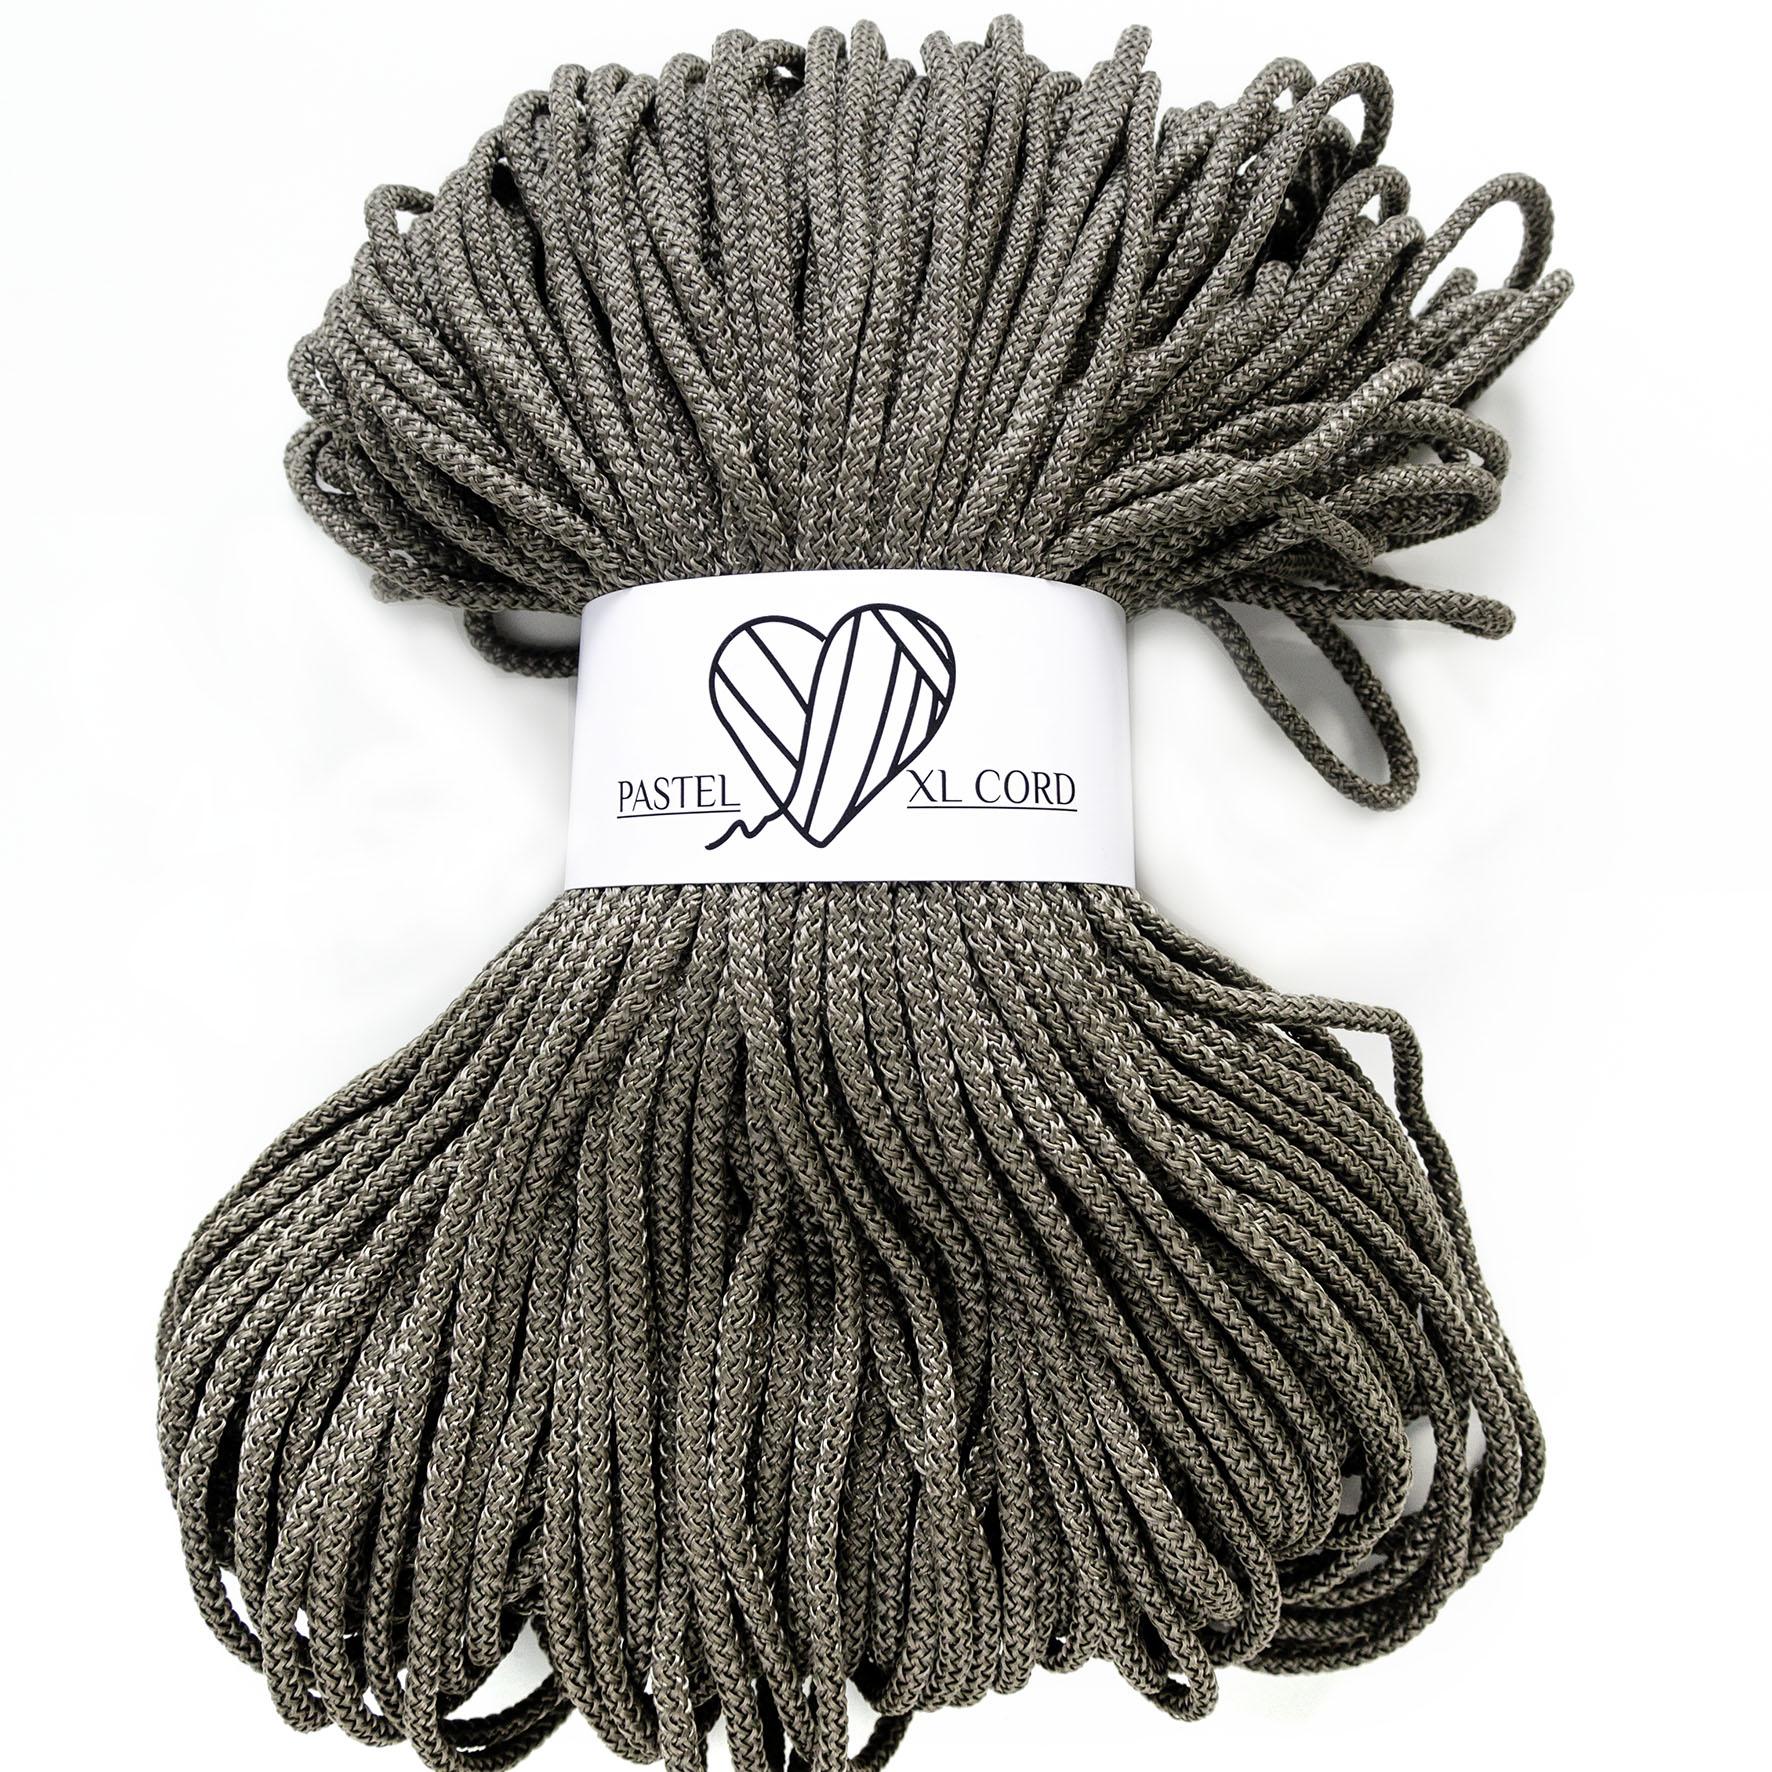 Полипропиленовый шнур Pastel XL cord Темная оливка